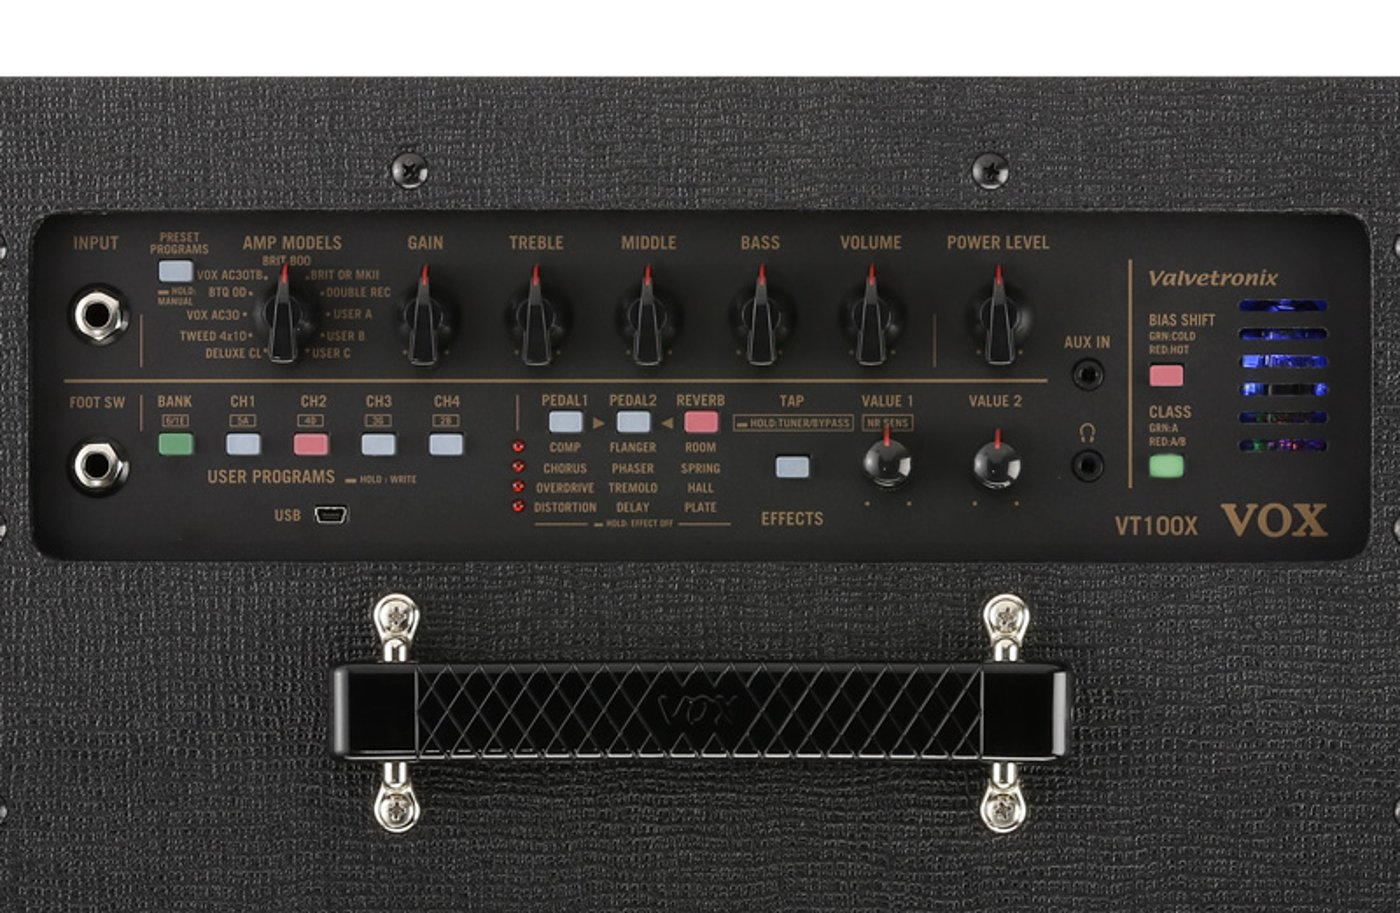 Modeling Amp, 20W